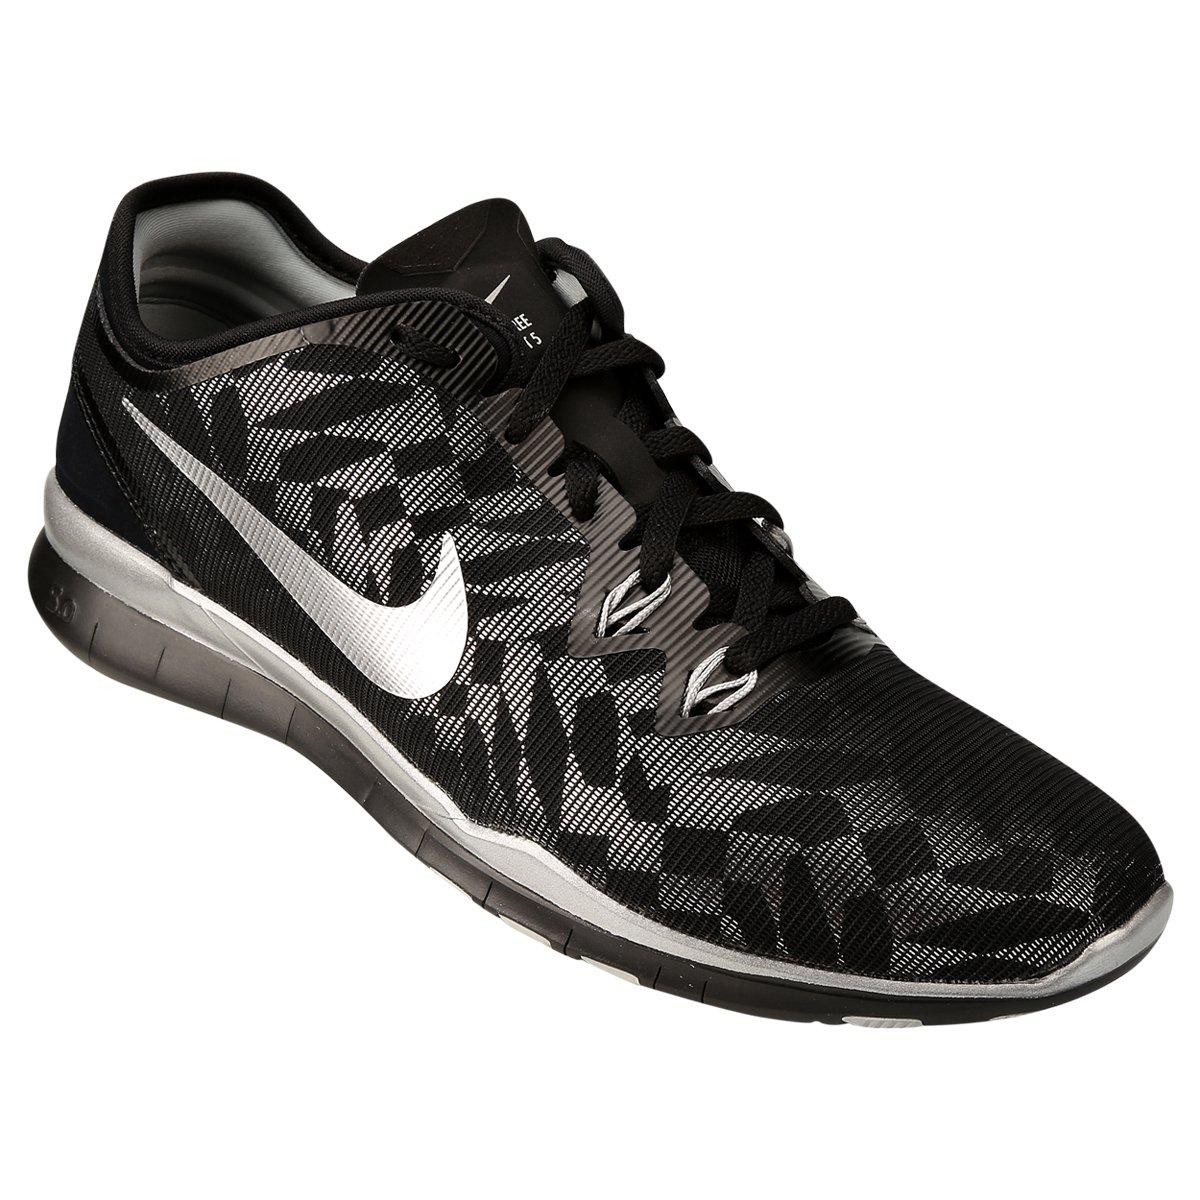 c6d49b6848e Tênis Nike Free 5.0 Tr Fit 5 Mtlc - Compre Agora